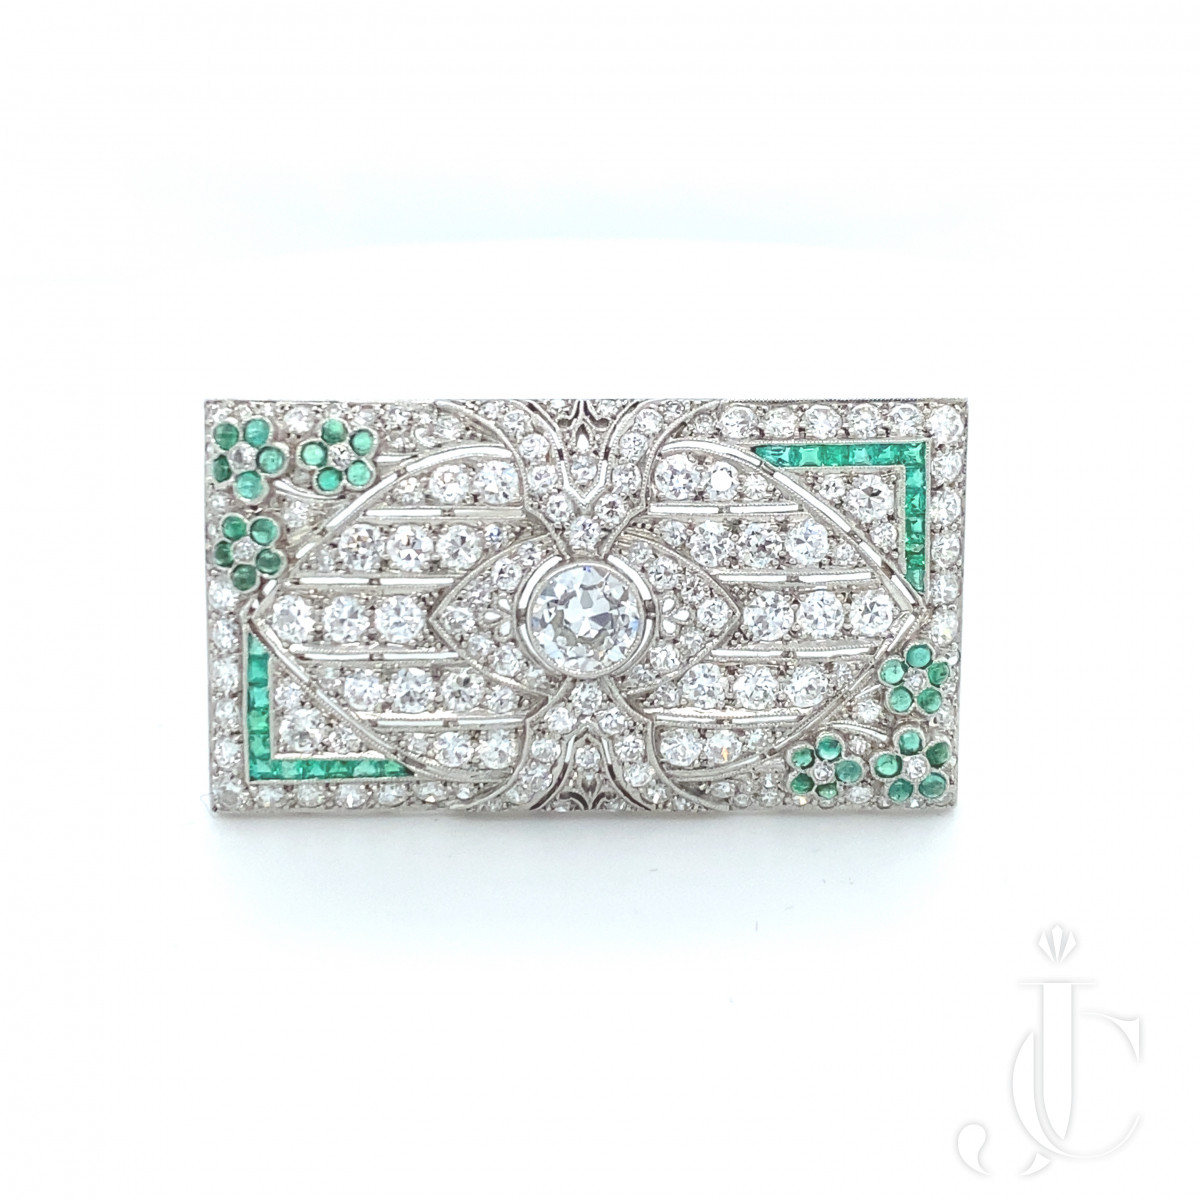 Diamond Emerald Art Deco Pin